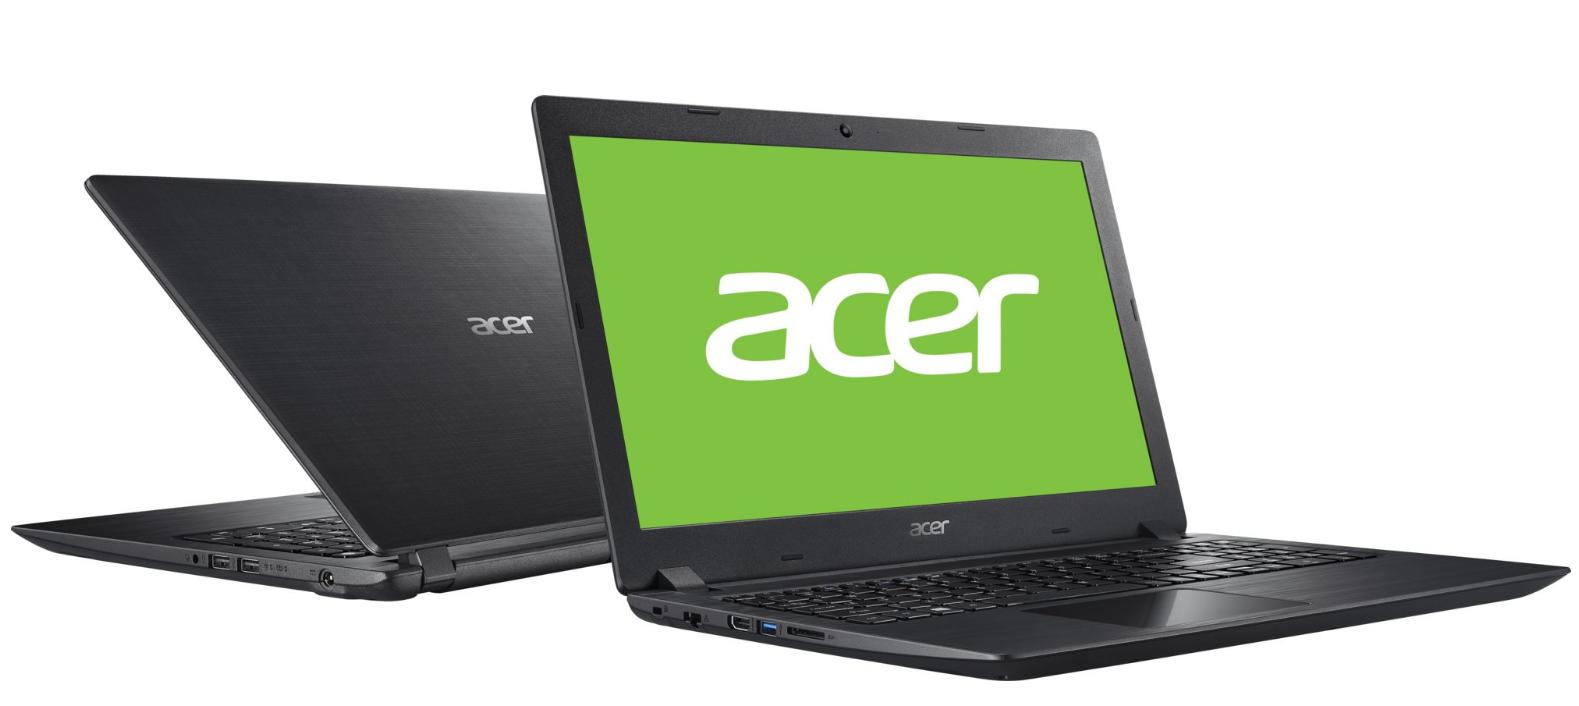 Лаптоп ACER A315-31-C2SU, Intel Celeron N3350, Intel HD Graphics 500, 15.6 инча